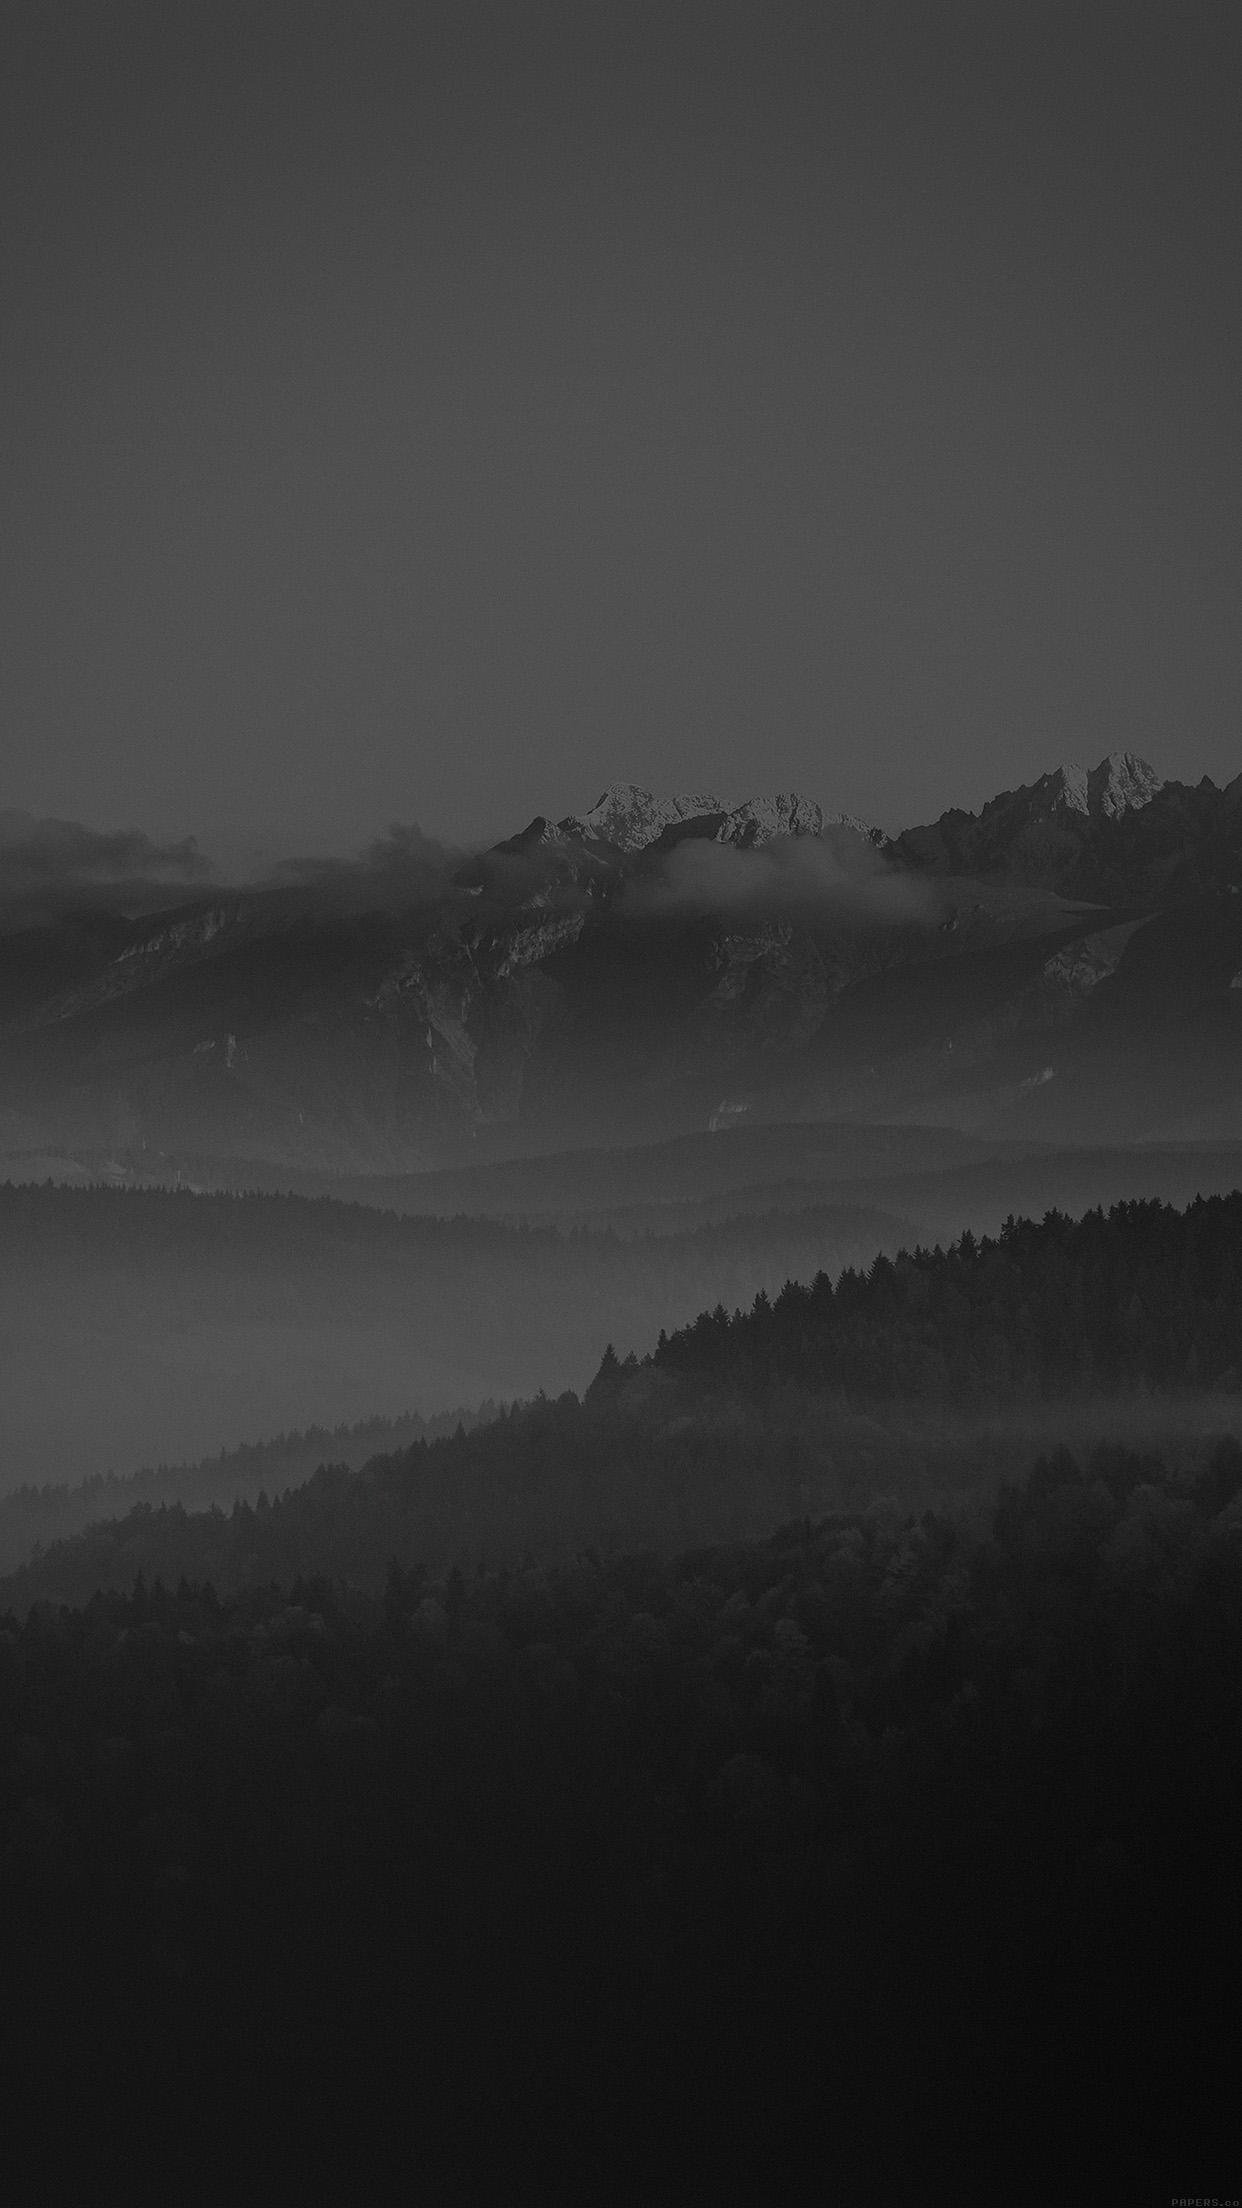 cloudy mountain phone wallpaper - photo #25